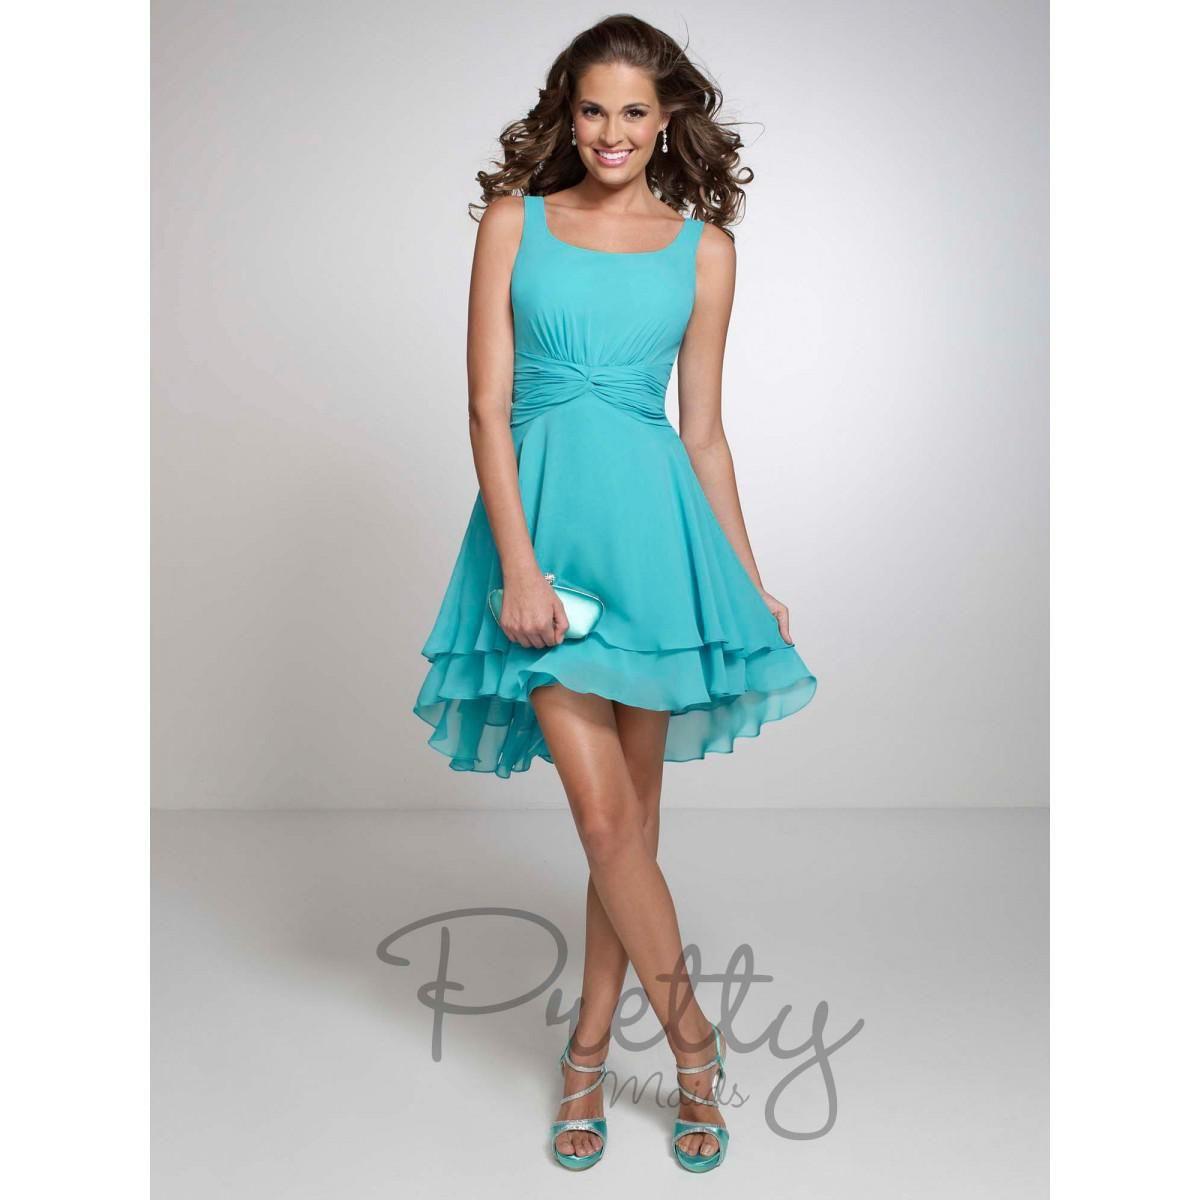 Turquoise Scoop Neck Chiffon Short Bridesmaid Dresses Mini Ruffles A ...